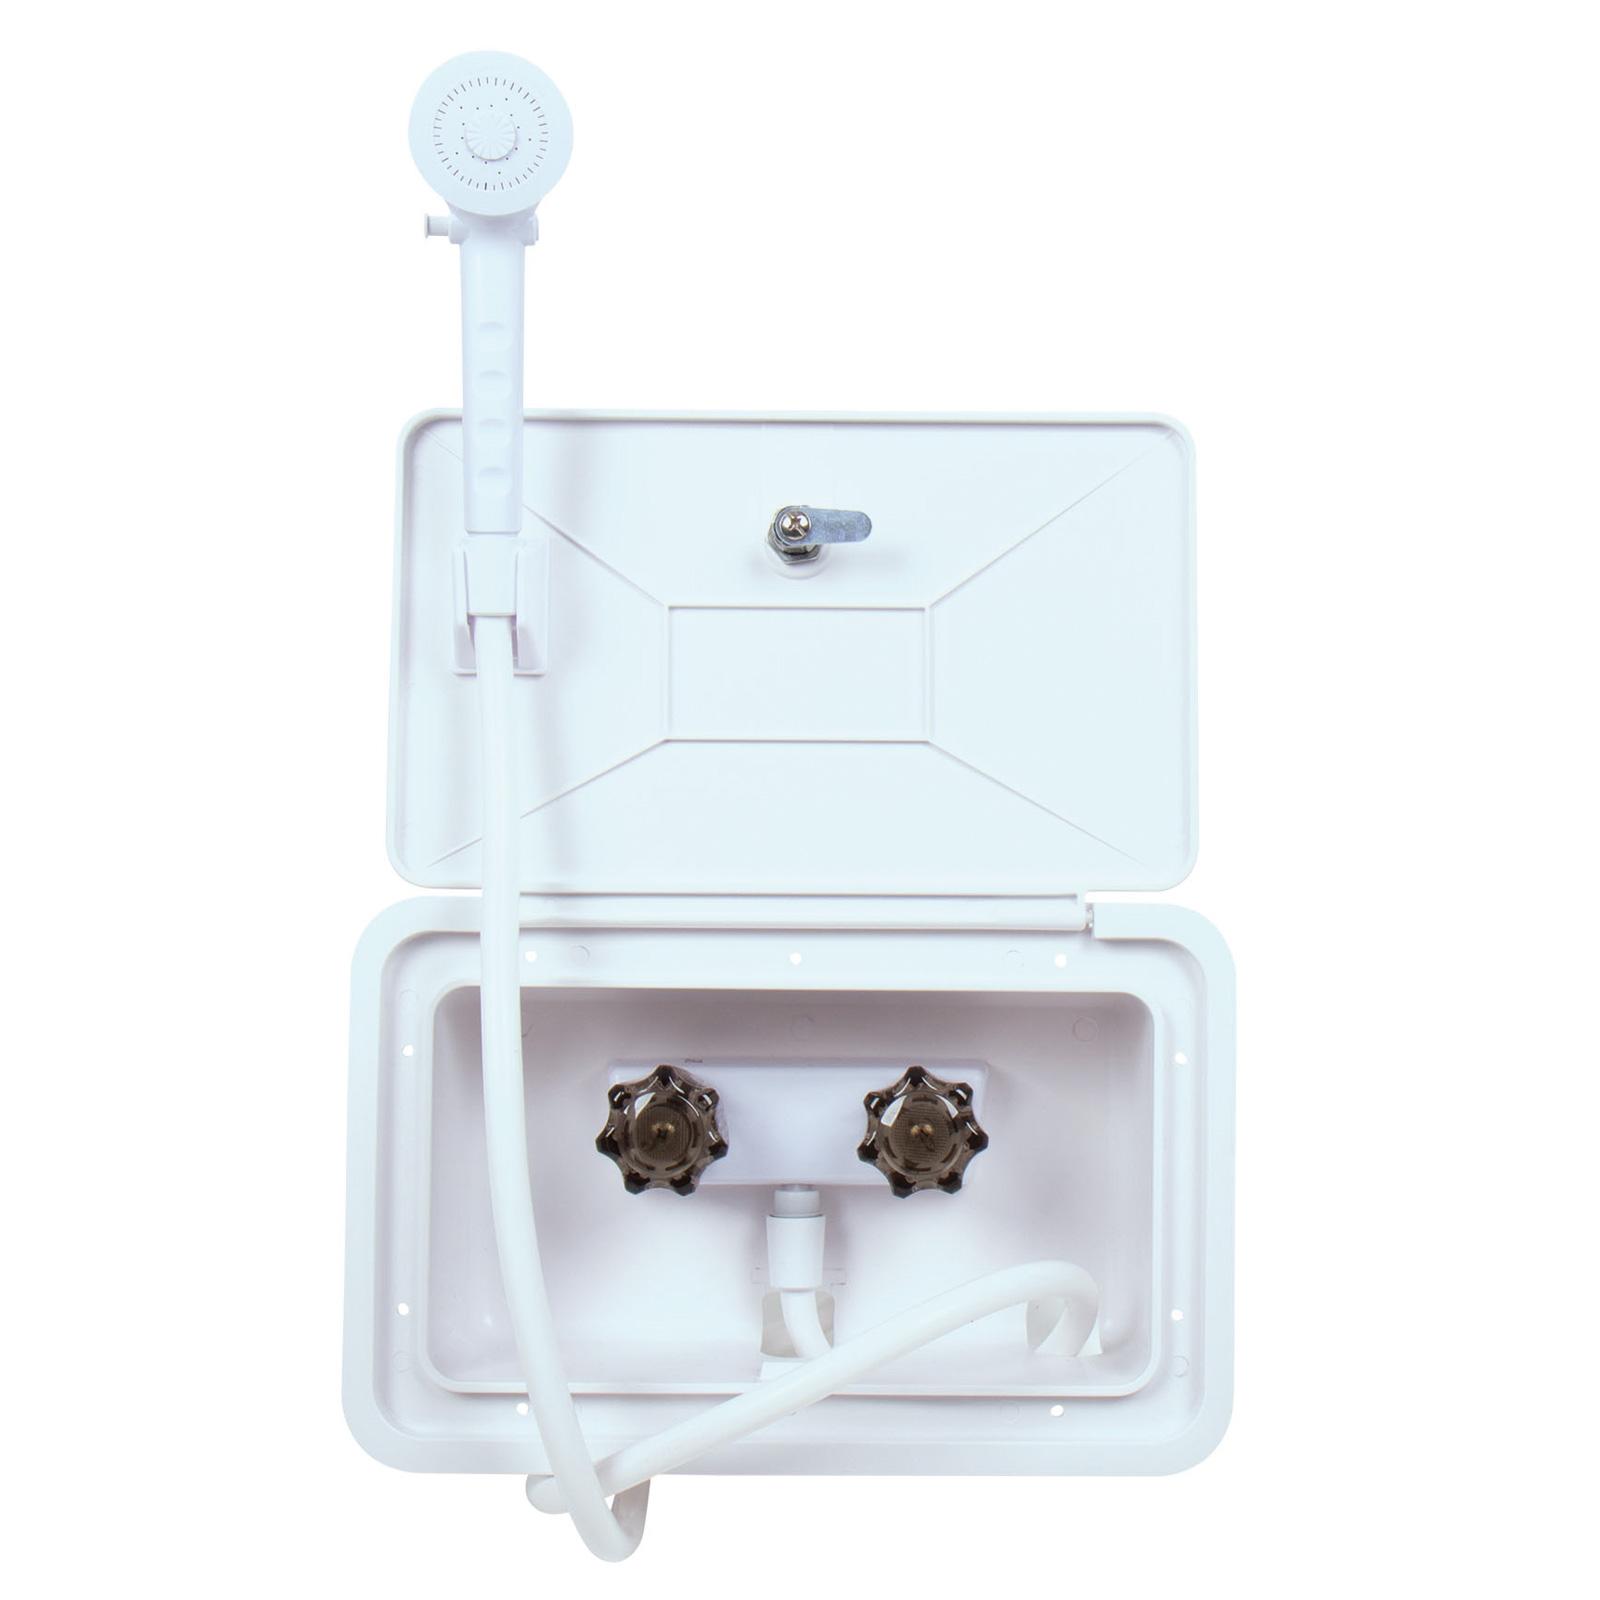 Außendusche Box, Serviceklappe, weiß, abschließbar, 345x220mm